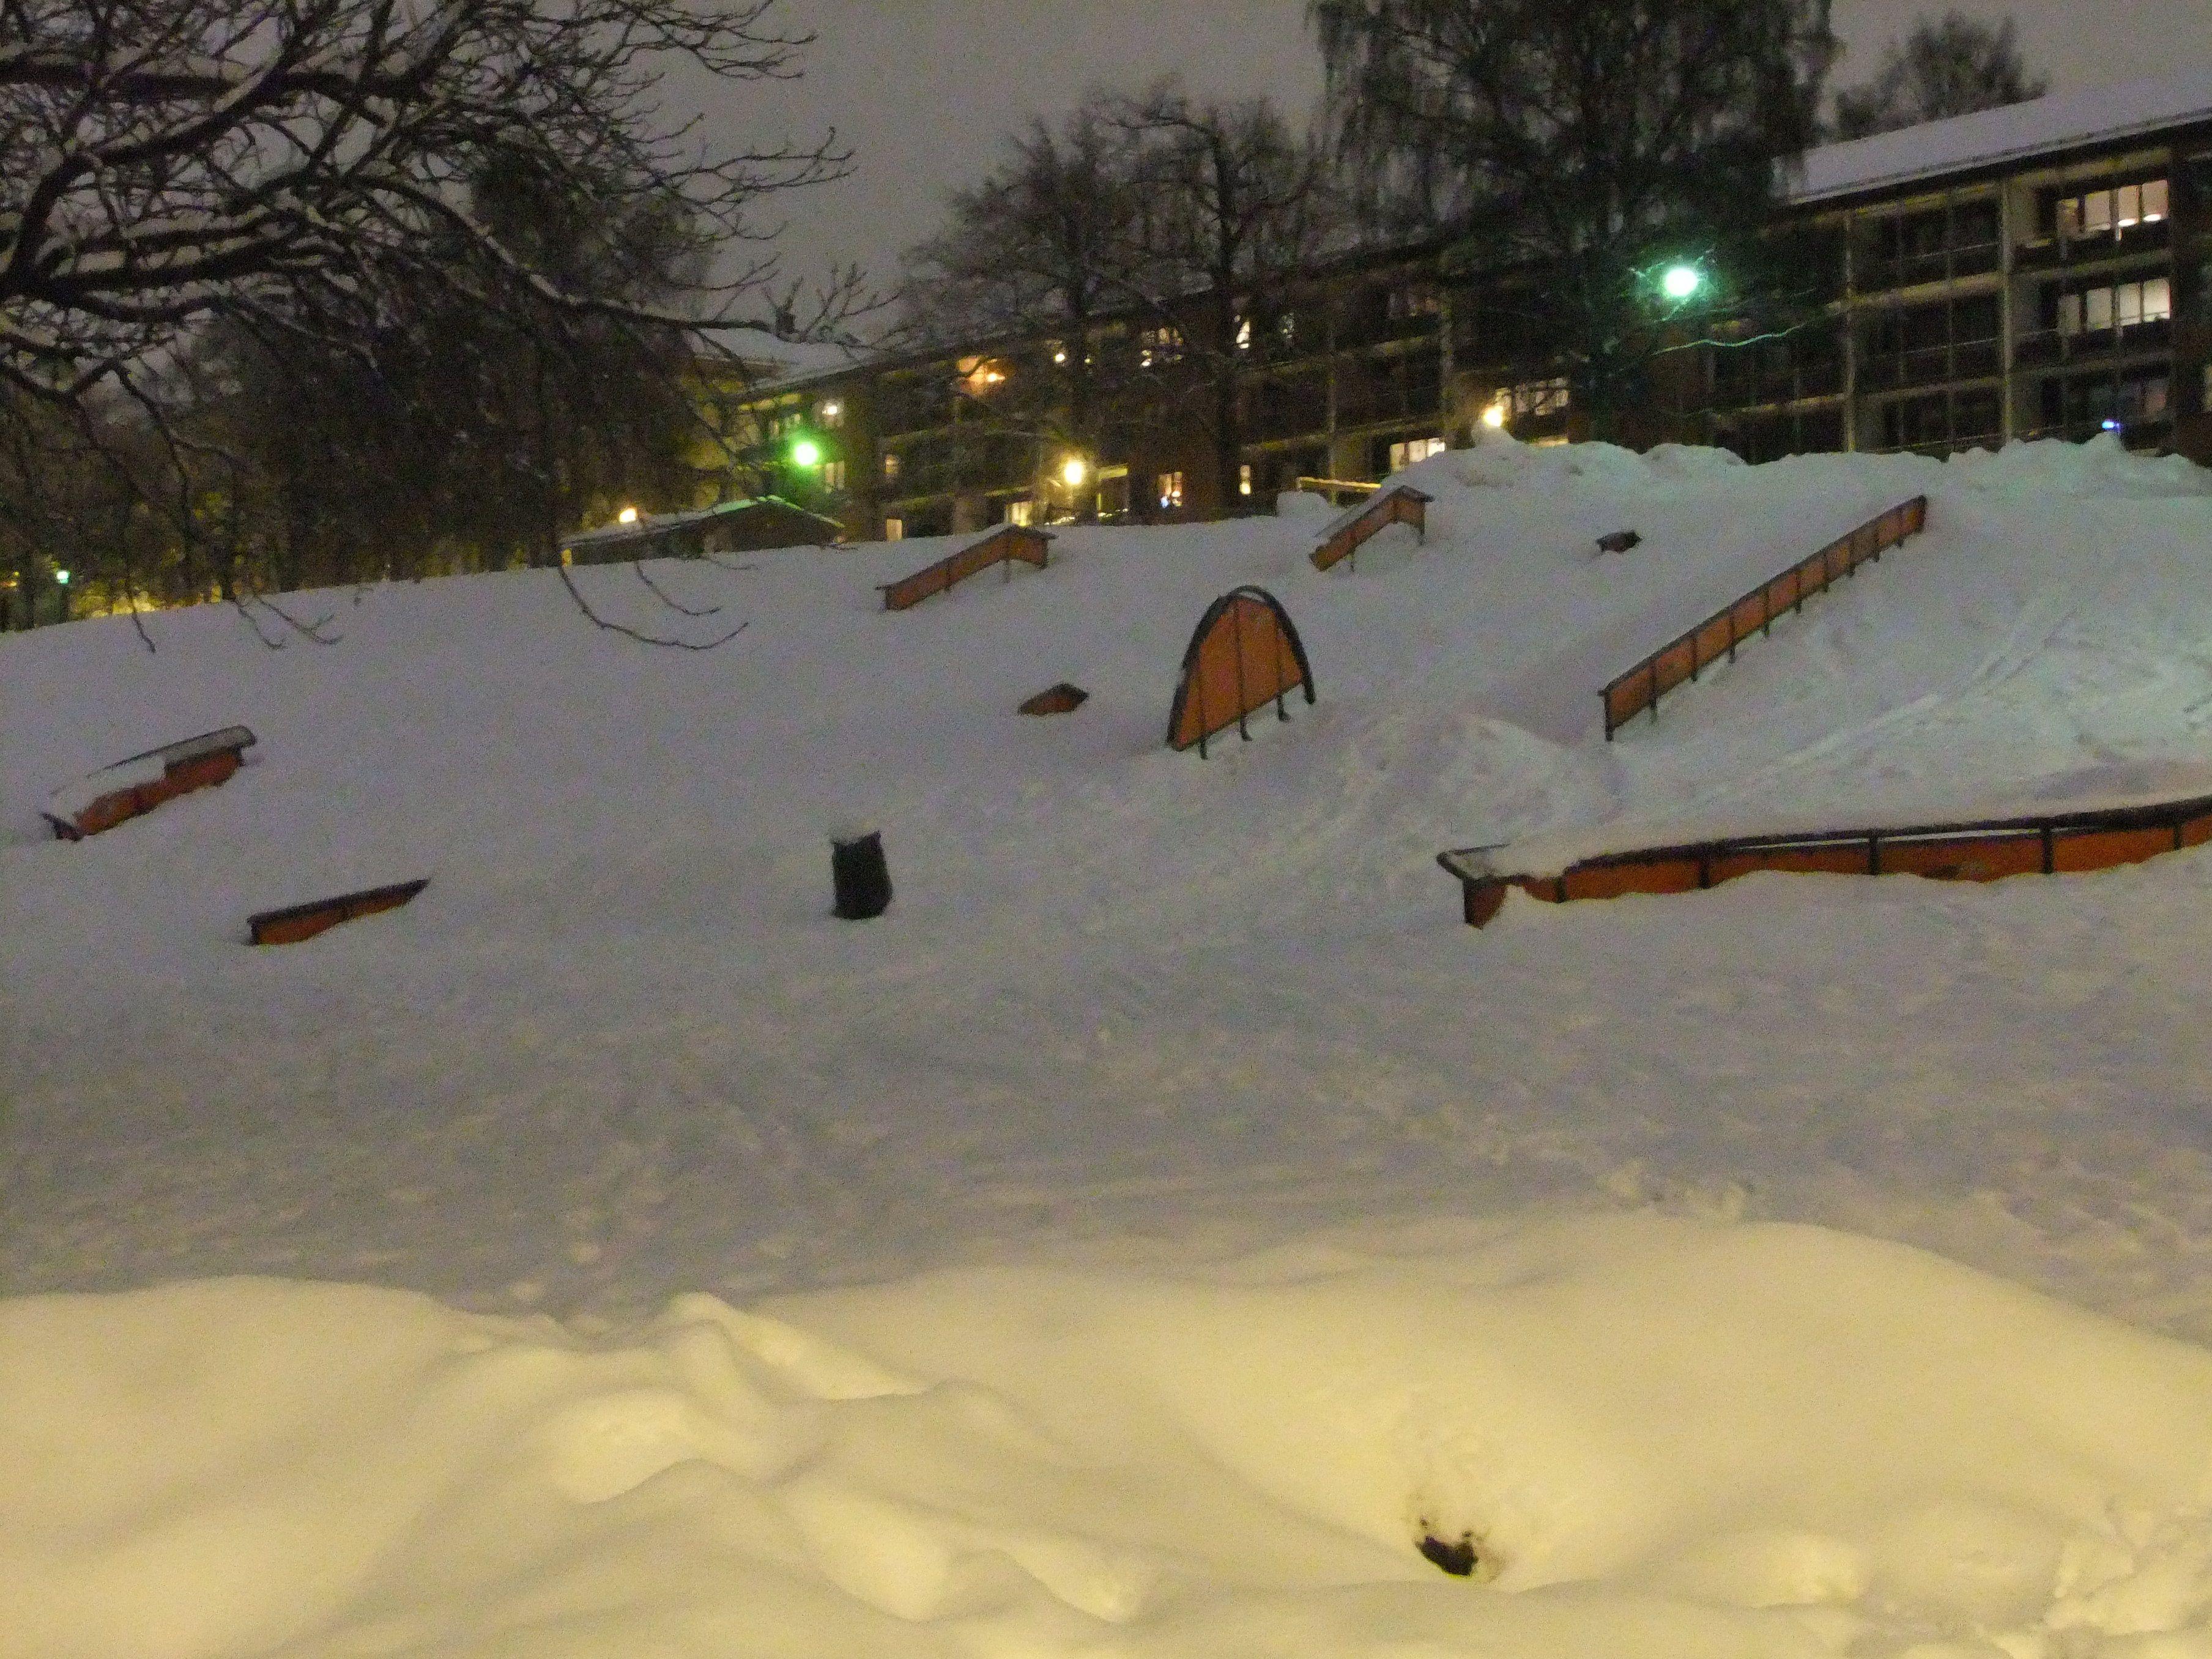 Backyard Terrain Park